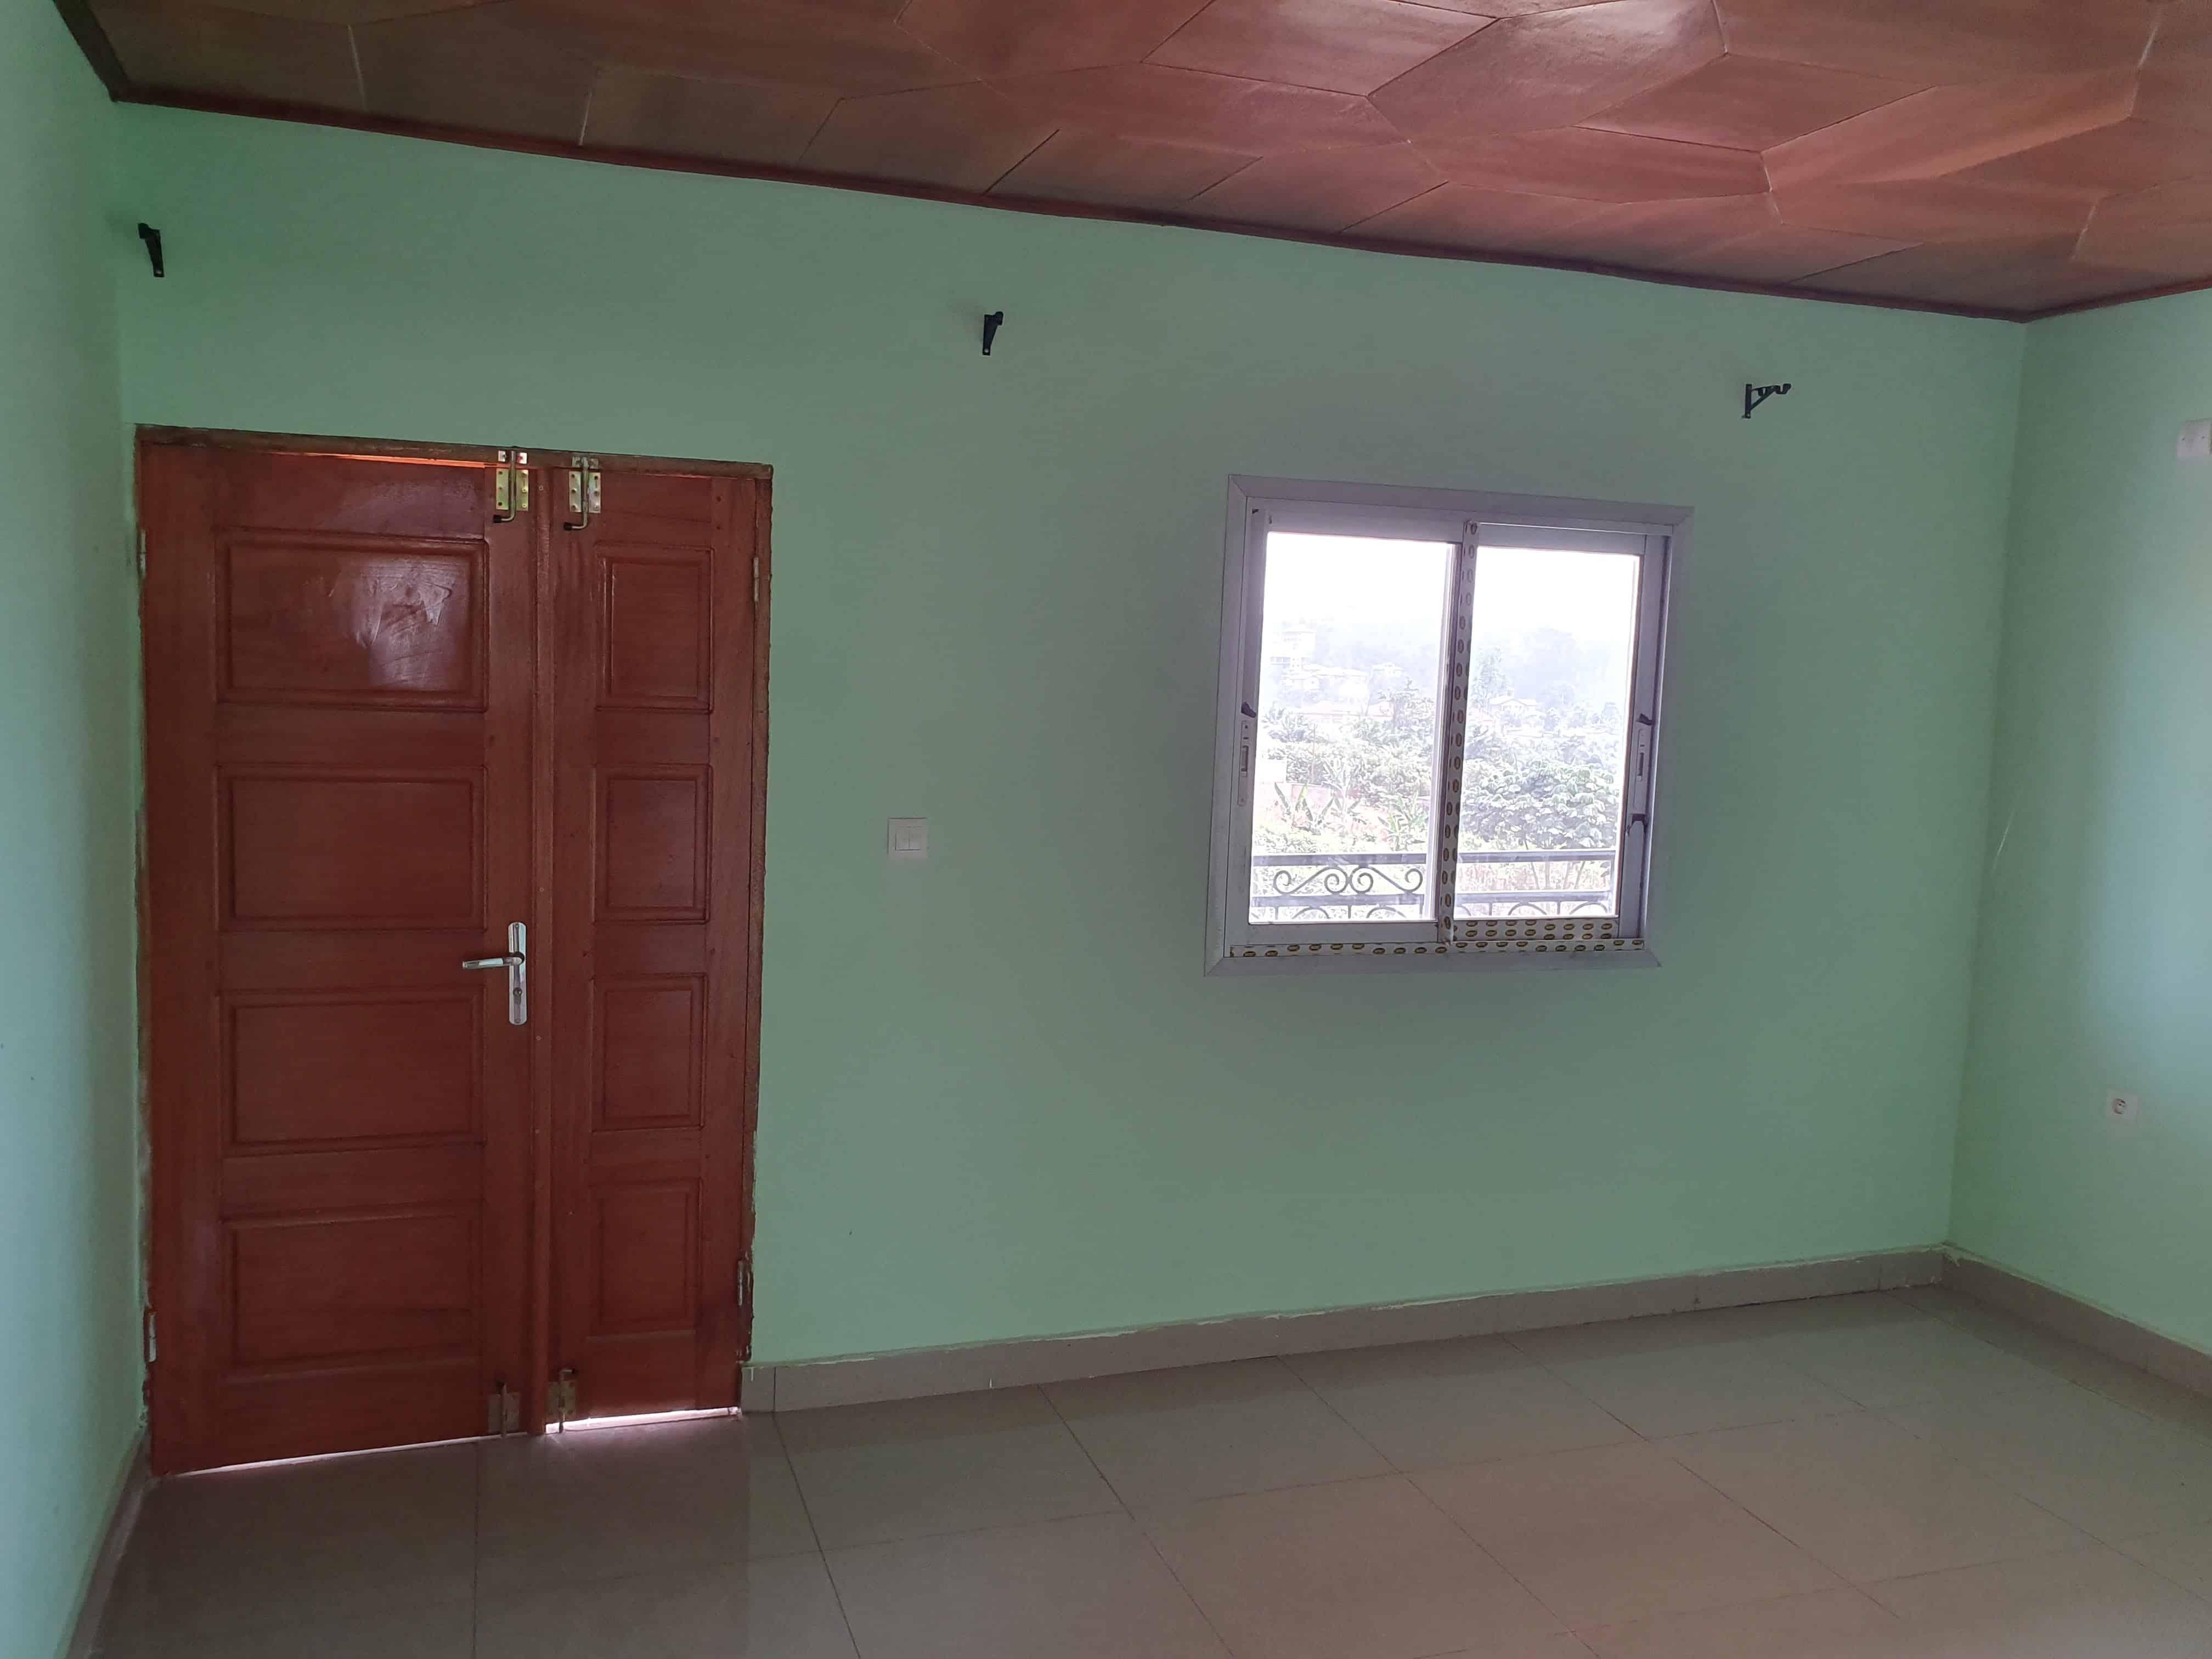 Apartment to rent - Yaoundé, Simbock, Val clair monté mechecam - 1 living room(s), 2 bedroom(s), 1 bathroom(s) - 80 000 FCFA / month